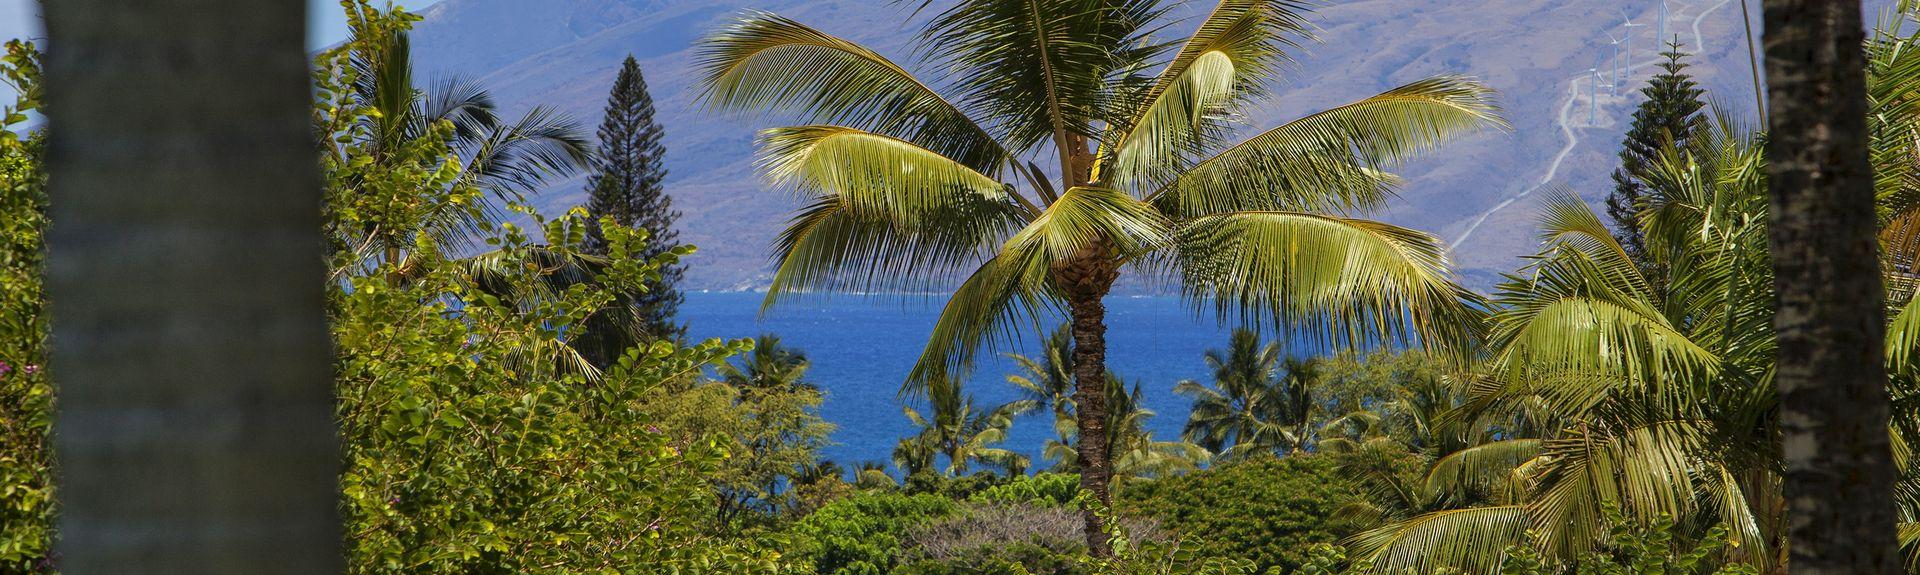 The Palms at Wailea, Wailea, Wailea-Makena, HI, USA